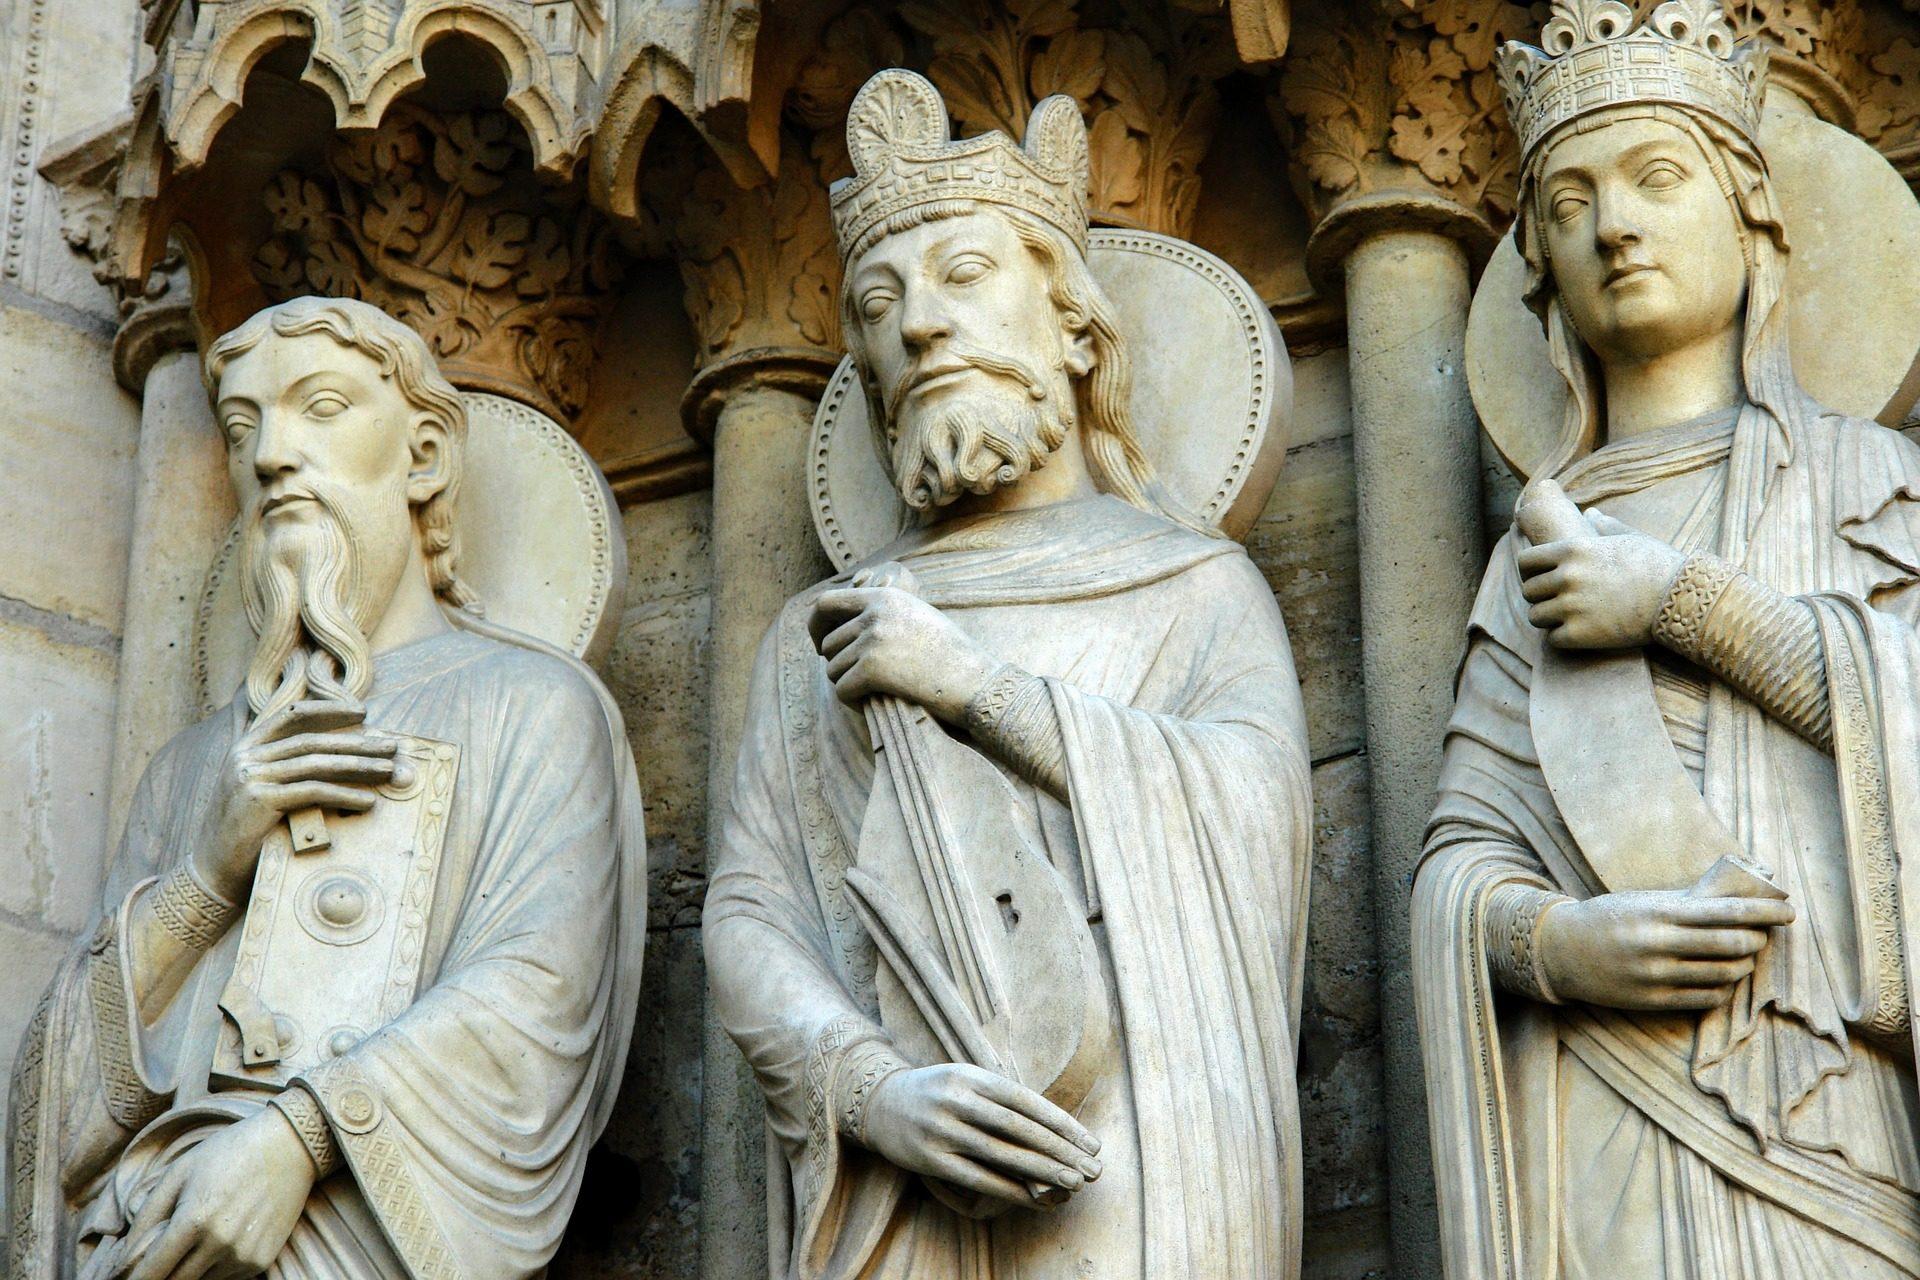 प्रतिमाओं, चर्च, कैथेड्रल, वास्तुकला, Notre Dame, पेरिस - HD वॉलपेपर - प्रोफेसर-falken.com